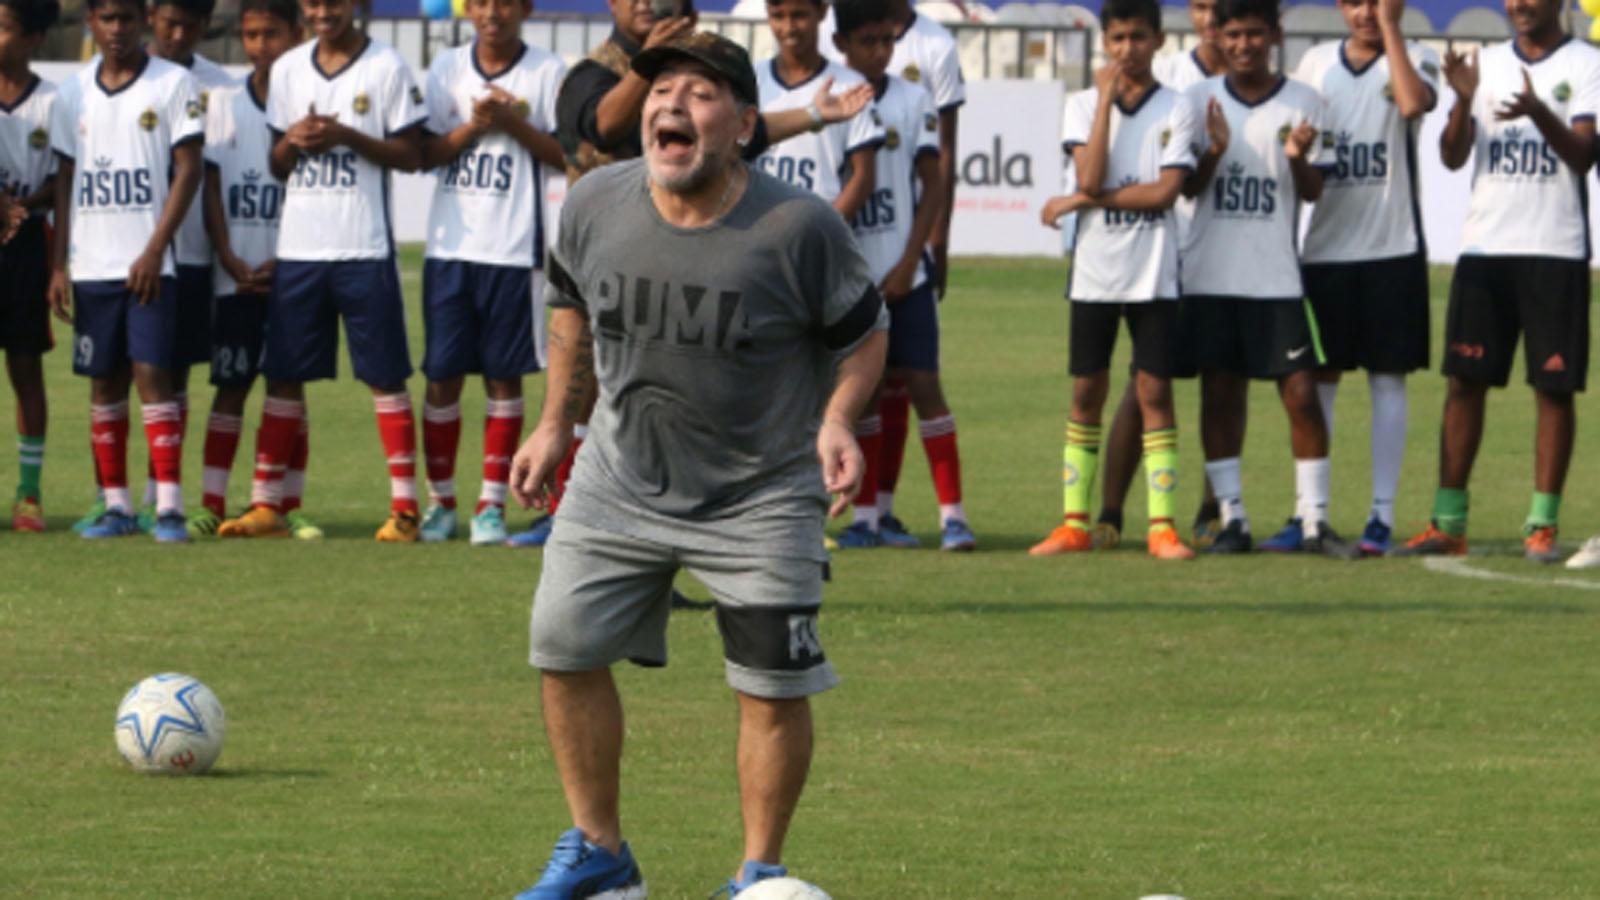 legendary-footballer-diego-maradona-dies-at-60-after-cardiac-arrest